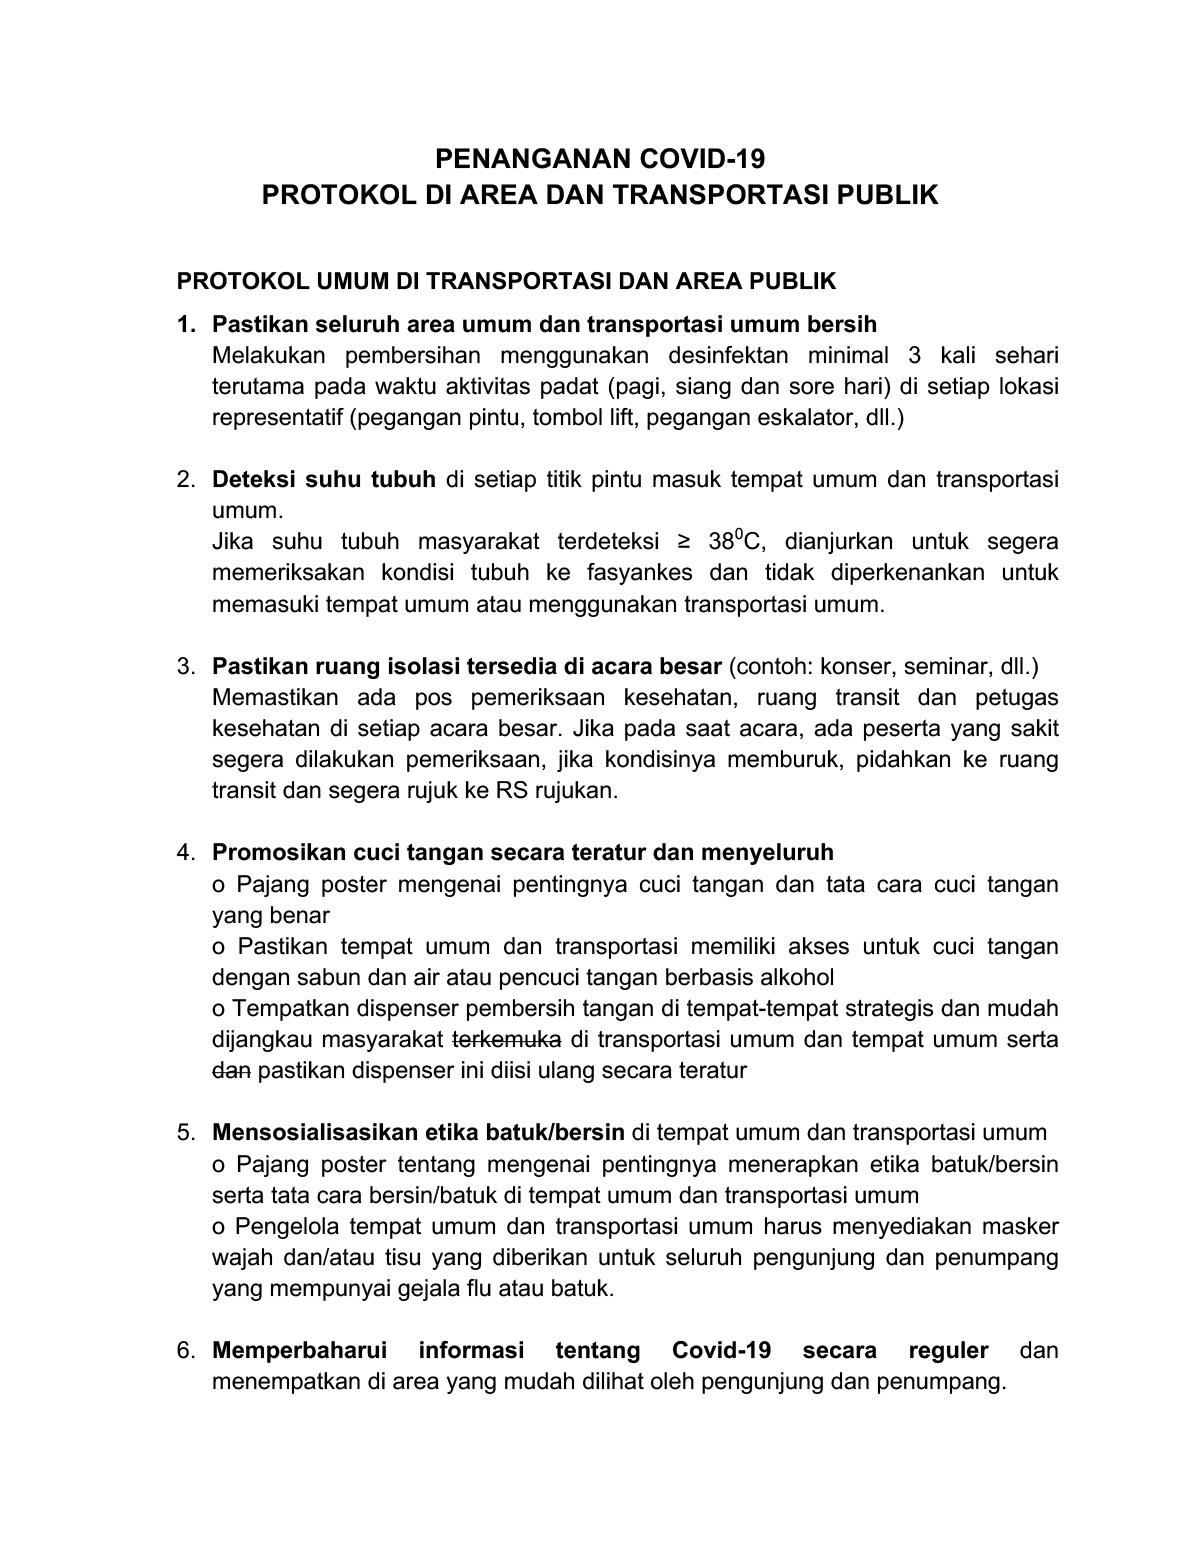 Materi Edukasi Informasi Siaga Covid 19 Dinas Kabupaten Klungkung